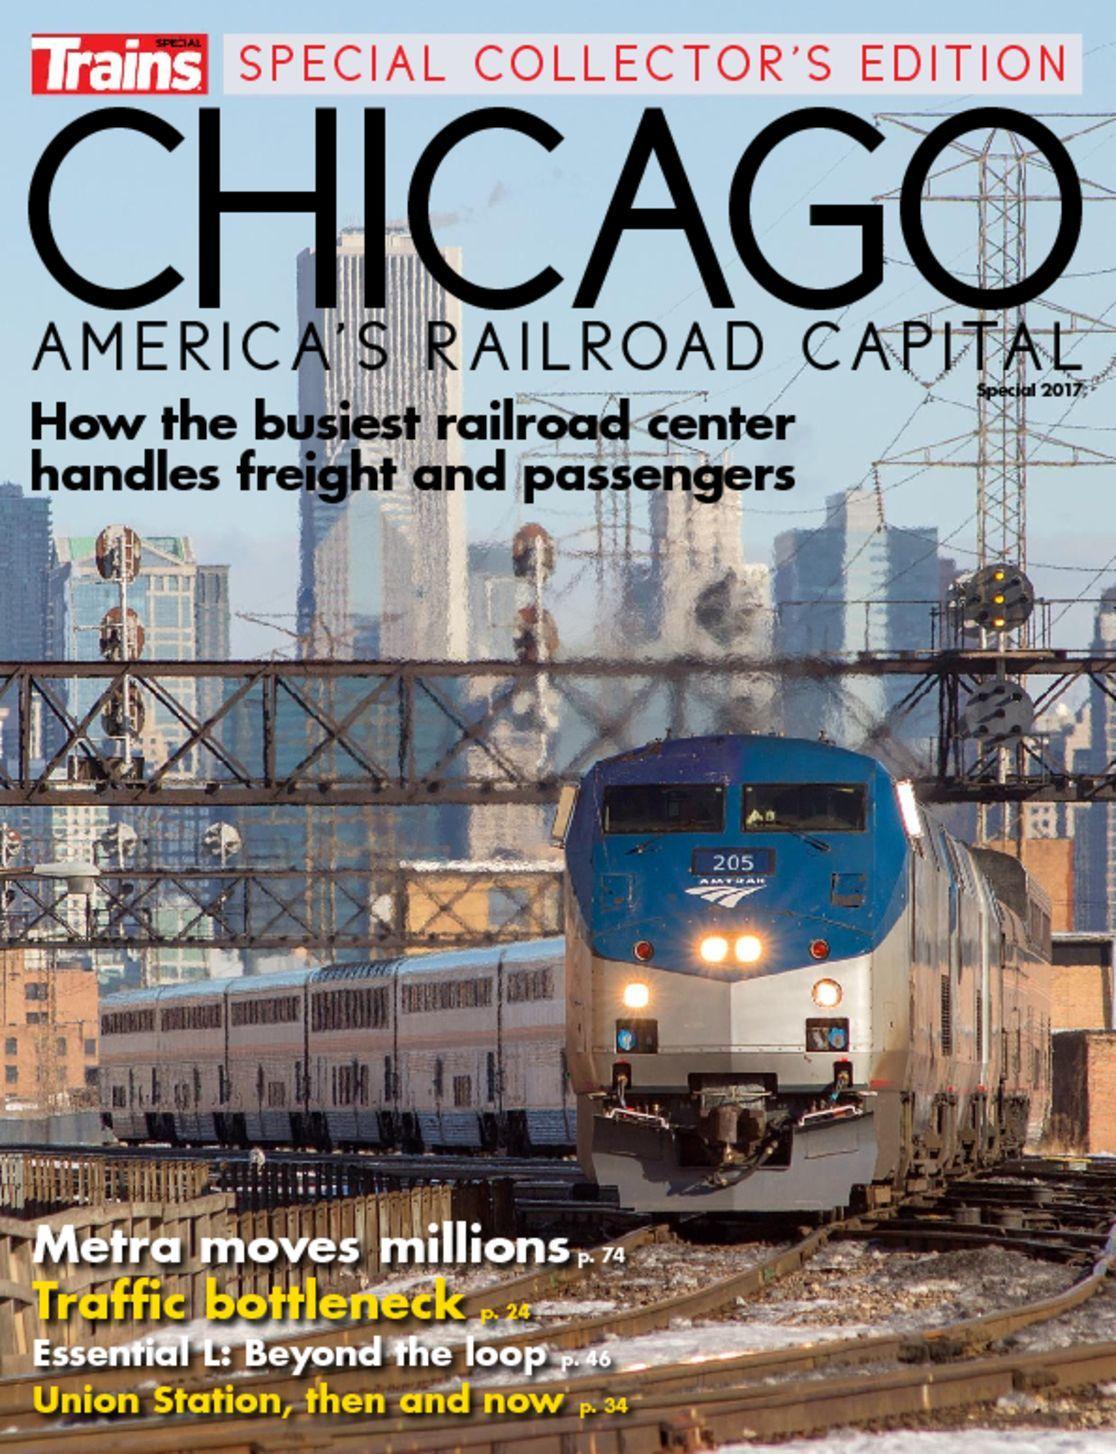 Chicago Americas Railroad Capital Digital